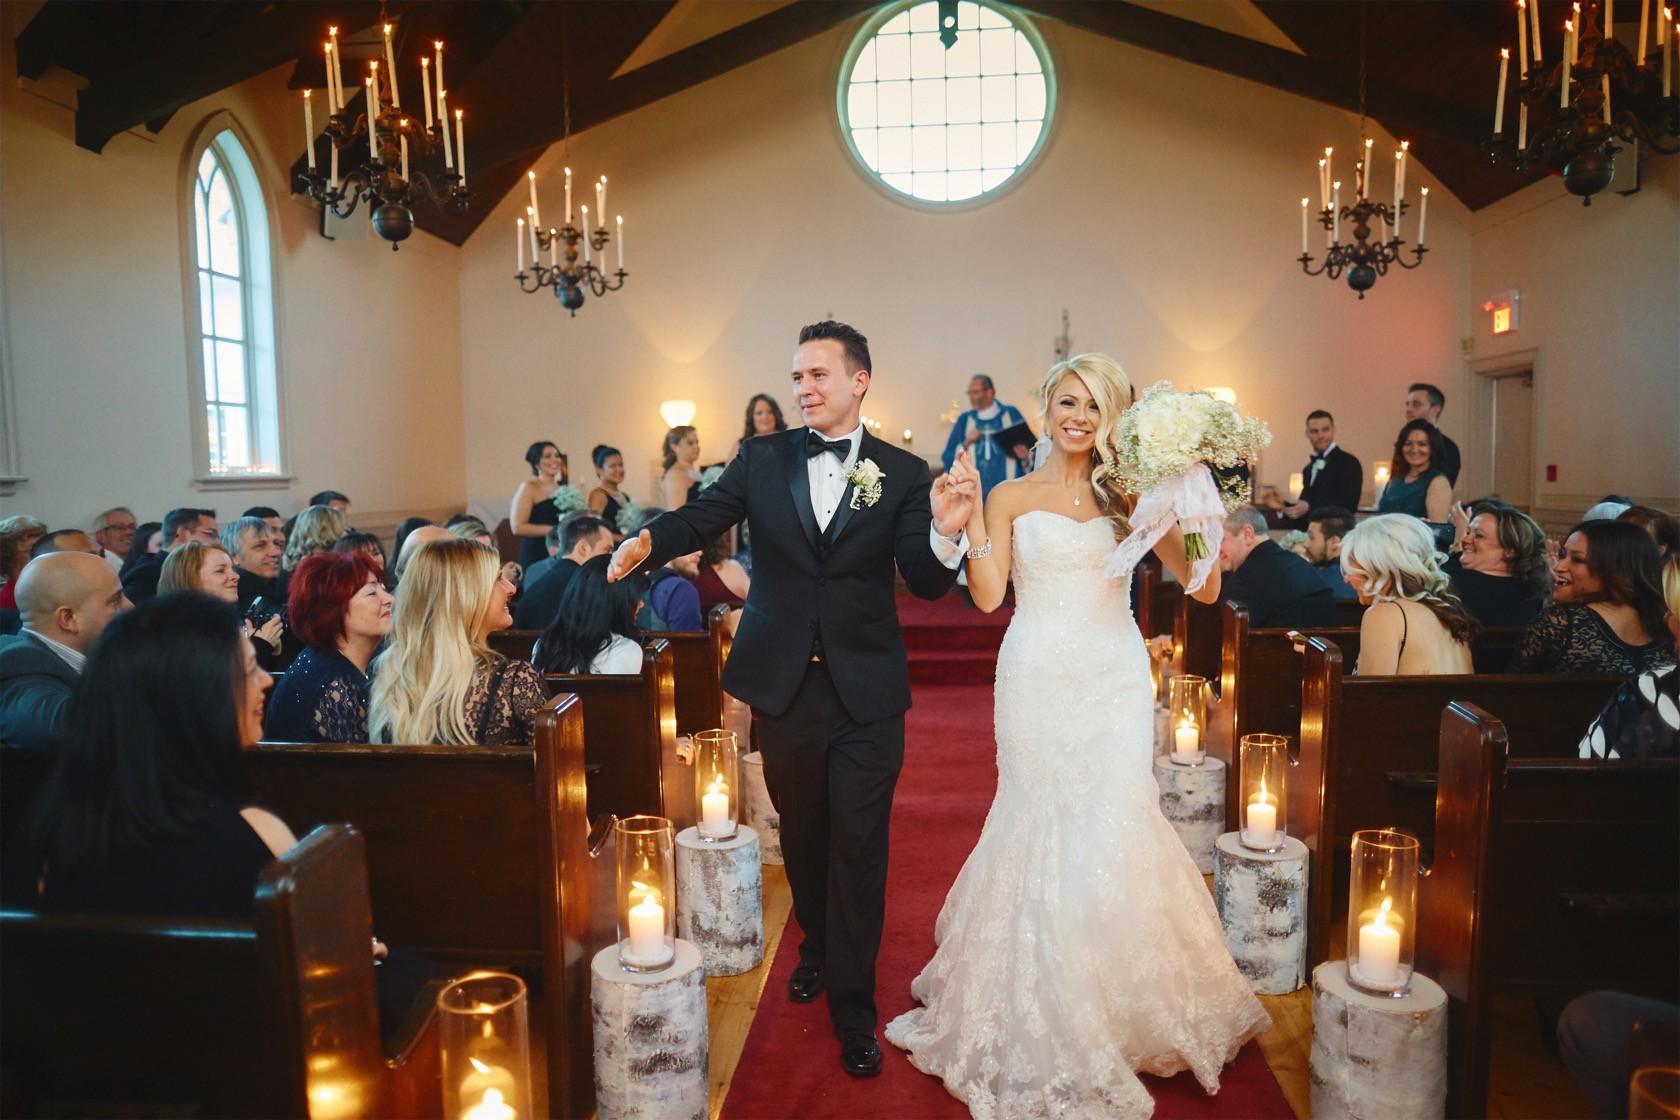 stephen sager photography 0058 fine art wedding photography